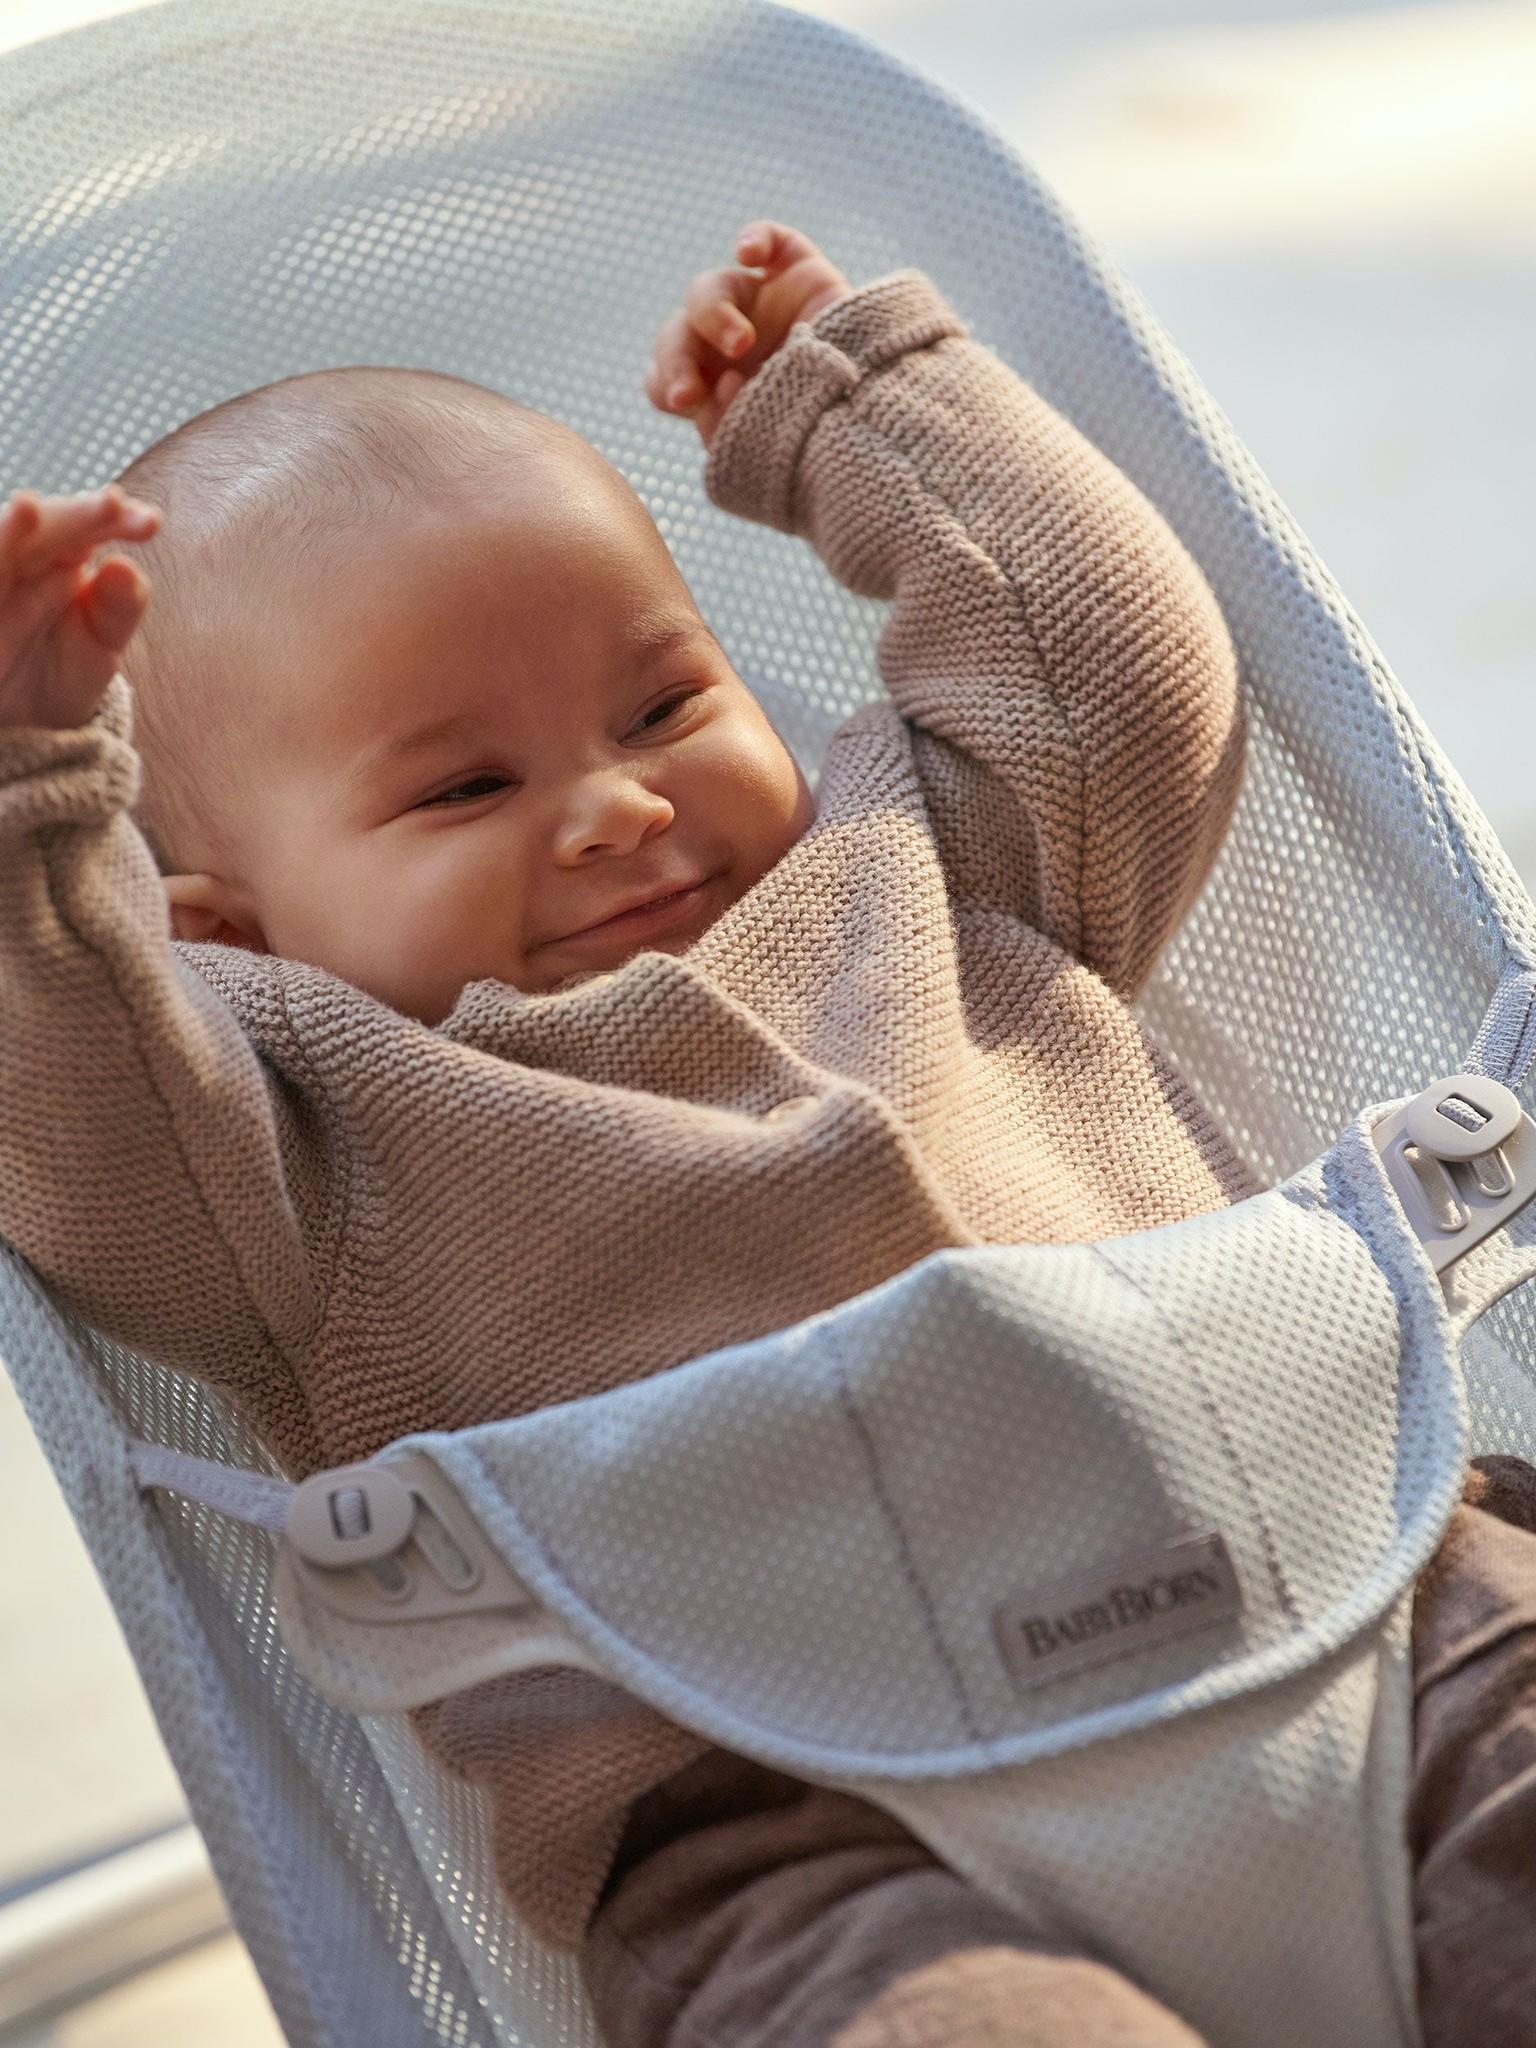 BABYBJÖRN BABYBJÖRN Wipstoeltje Balance Soft Lichtgrijs frame Zilver-Wit Mesh